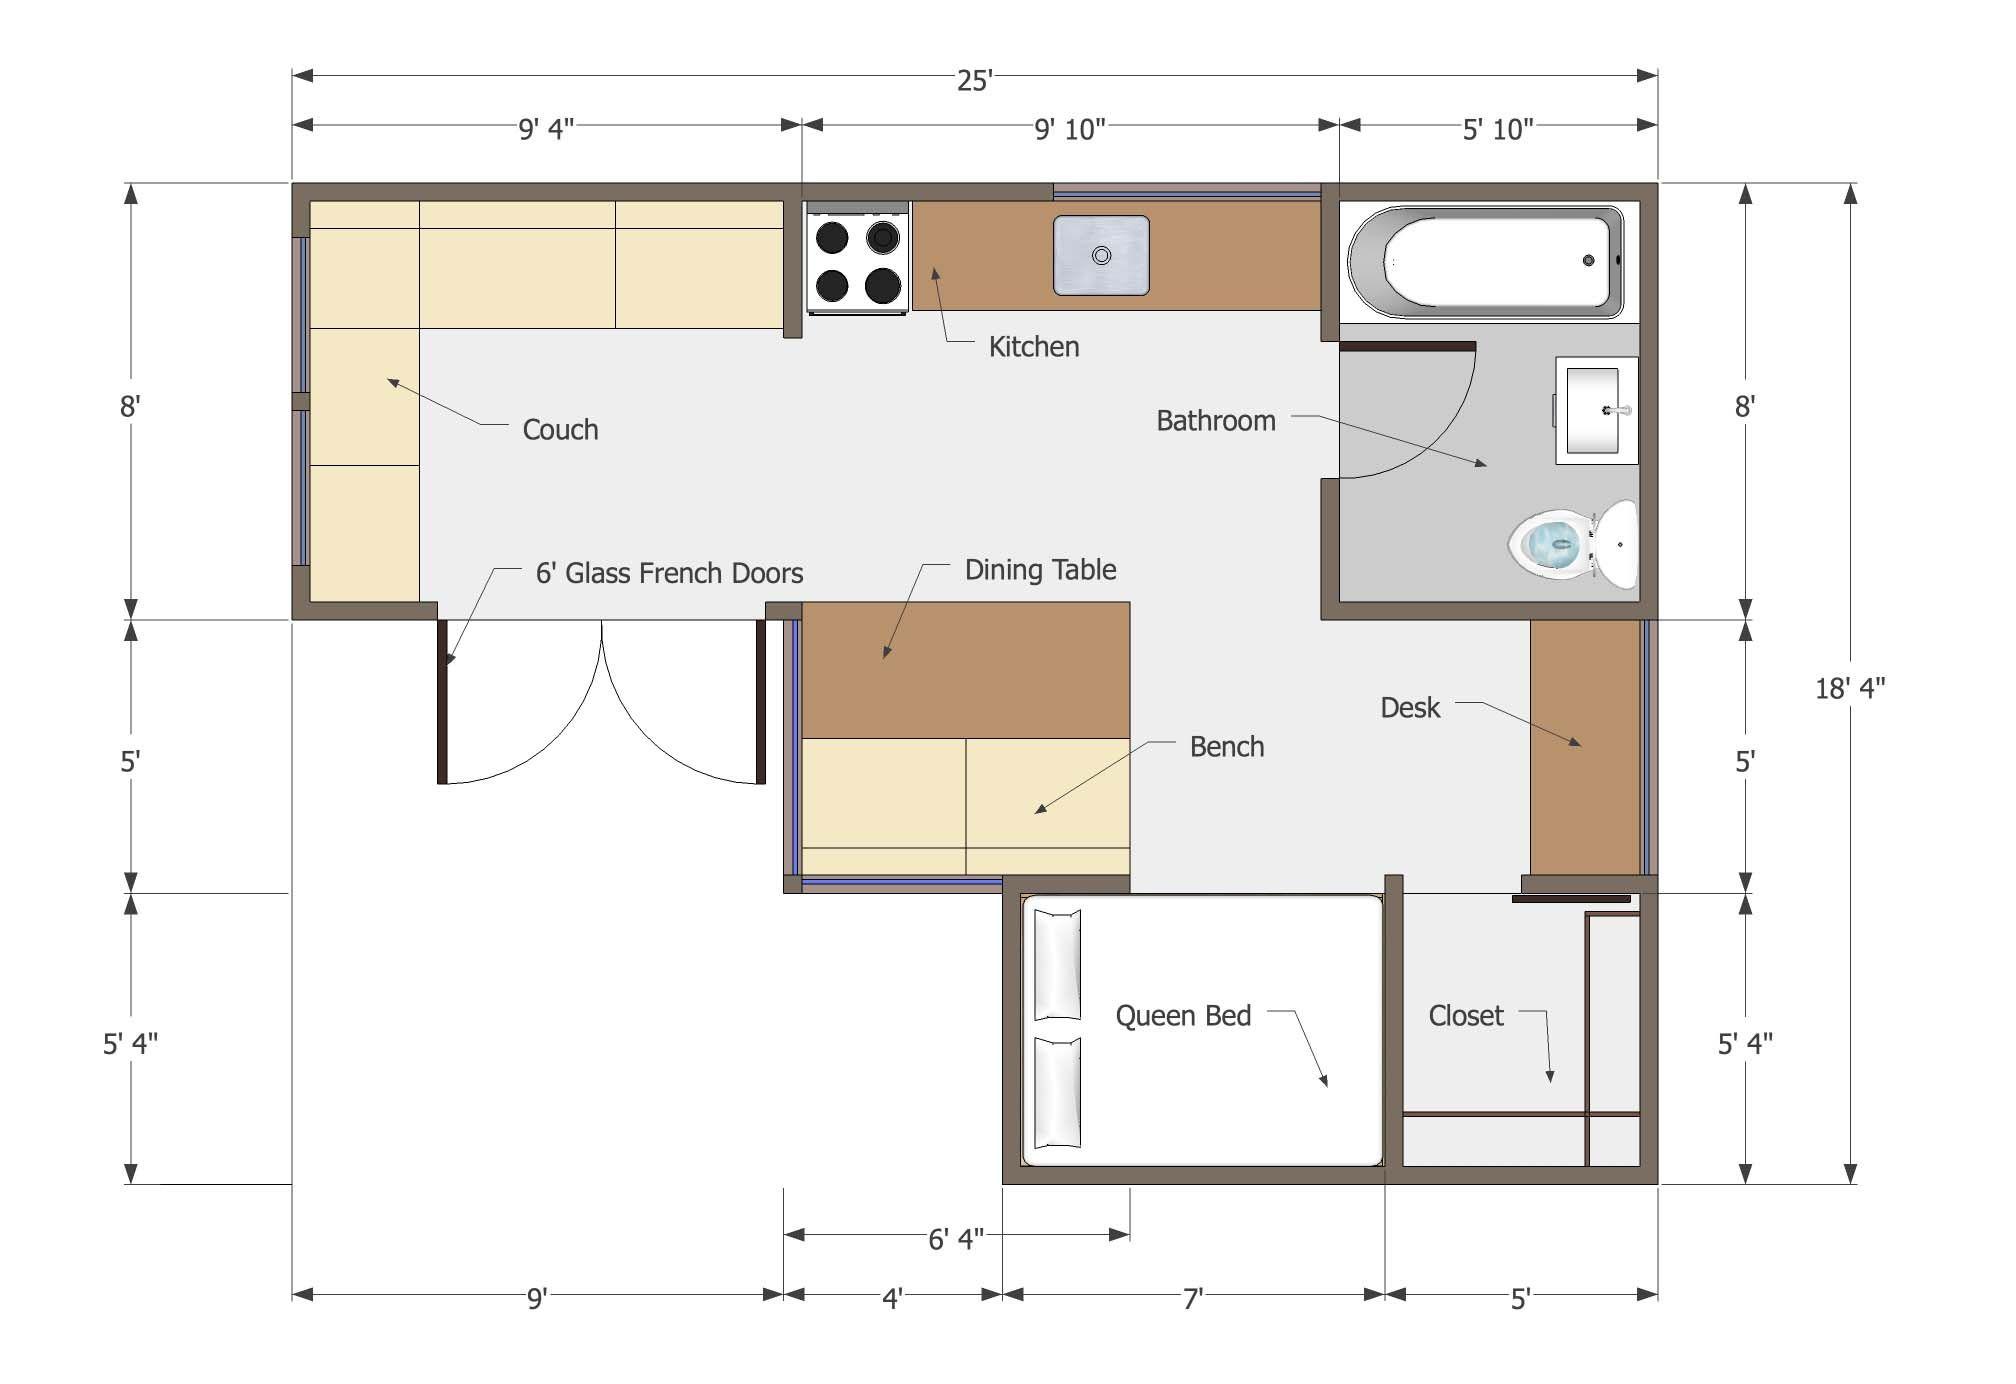 pleasing joseph sandy small house floor plan 350 sq ft l shaped desk plans - 9 Sq Ft Tiny House Floor Plans